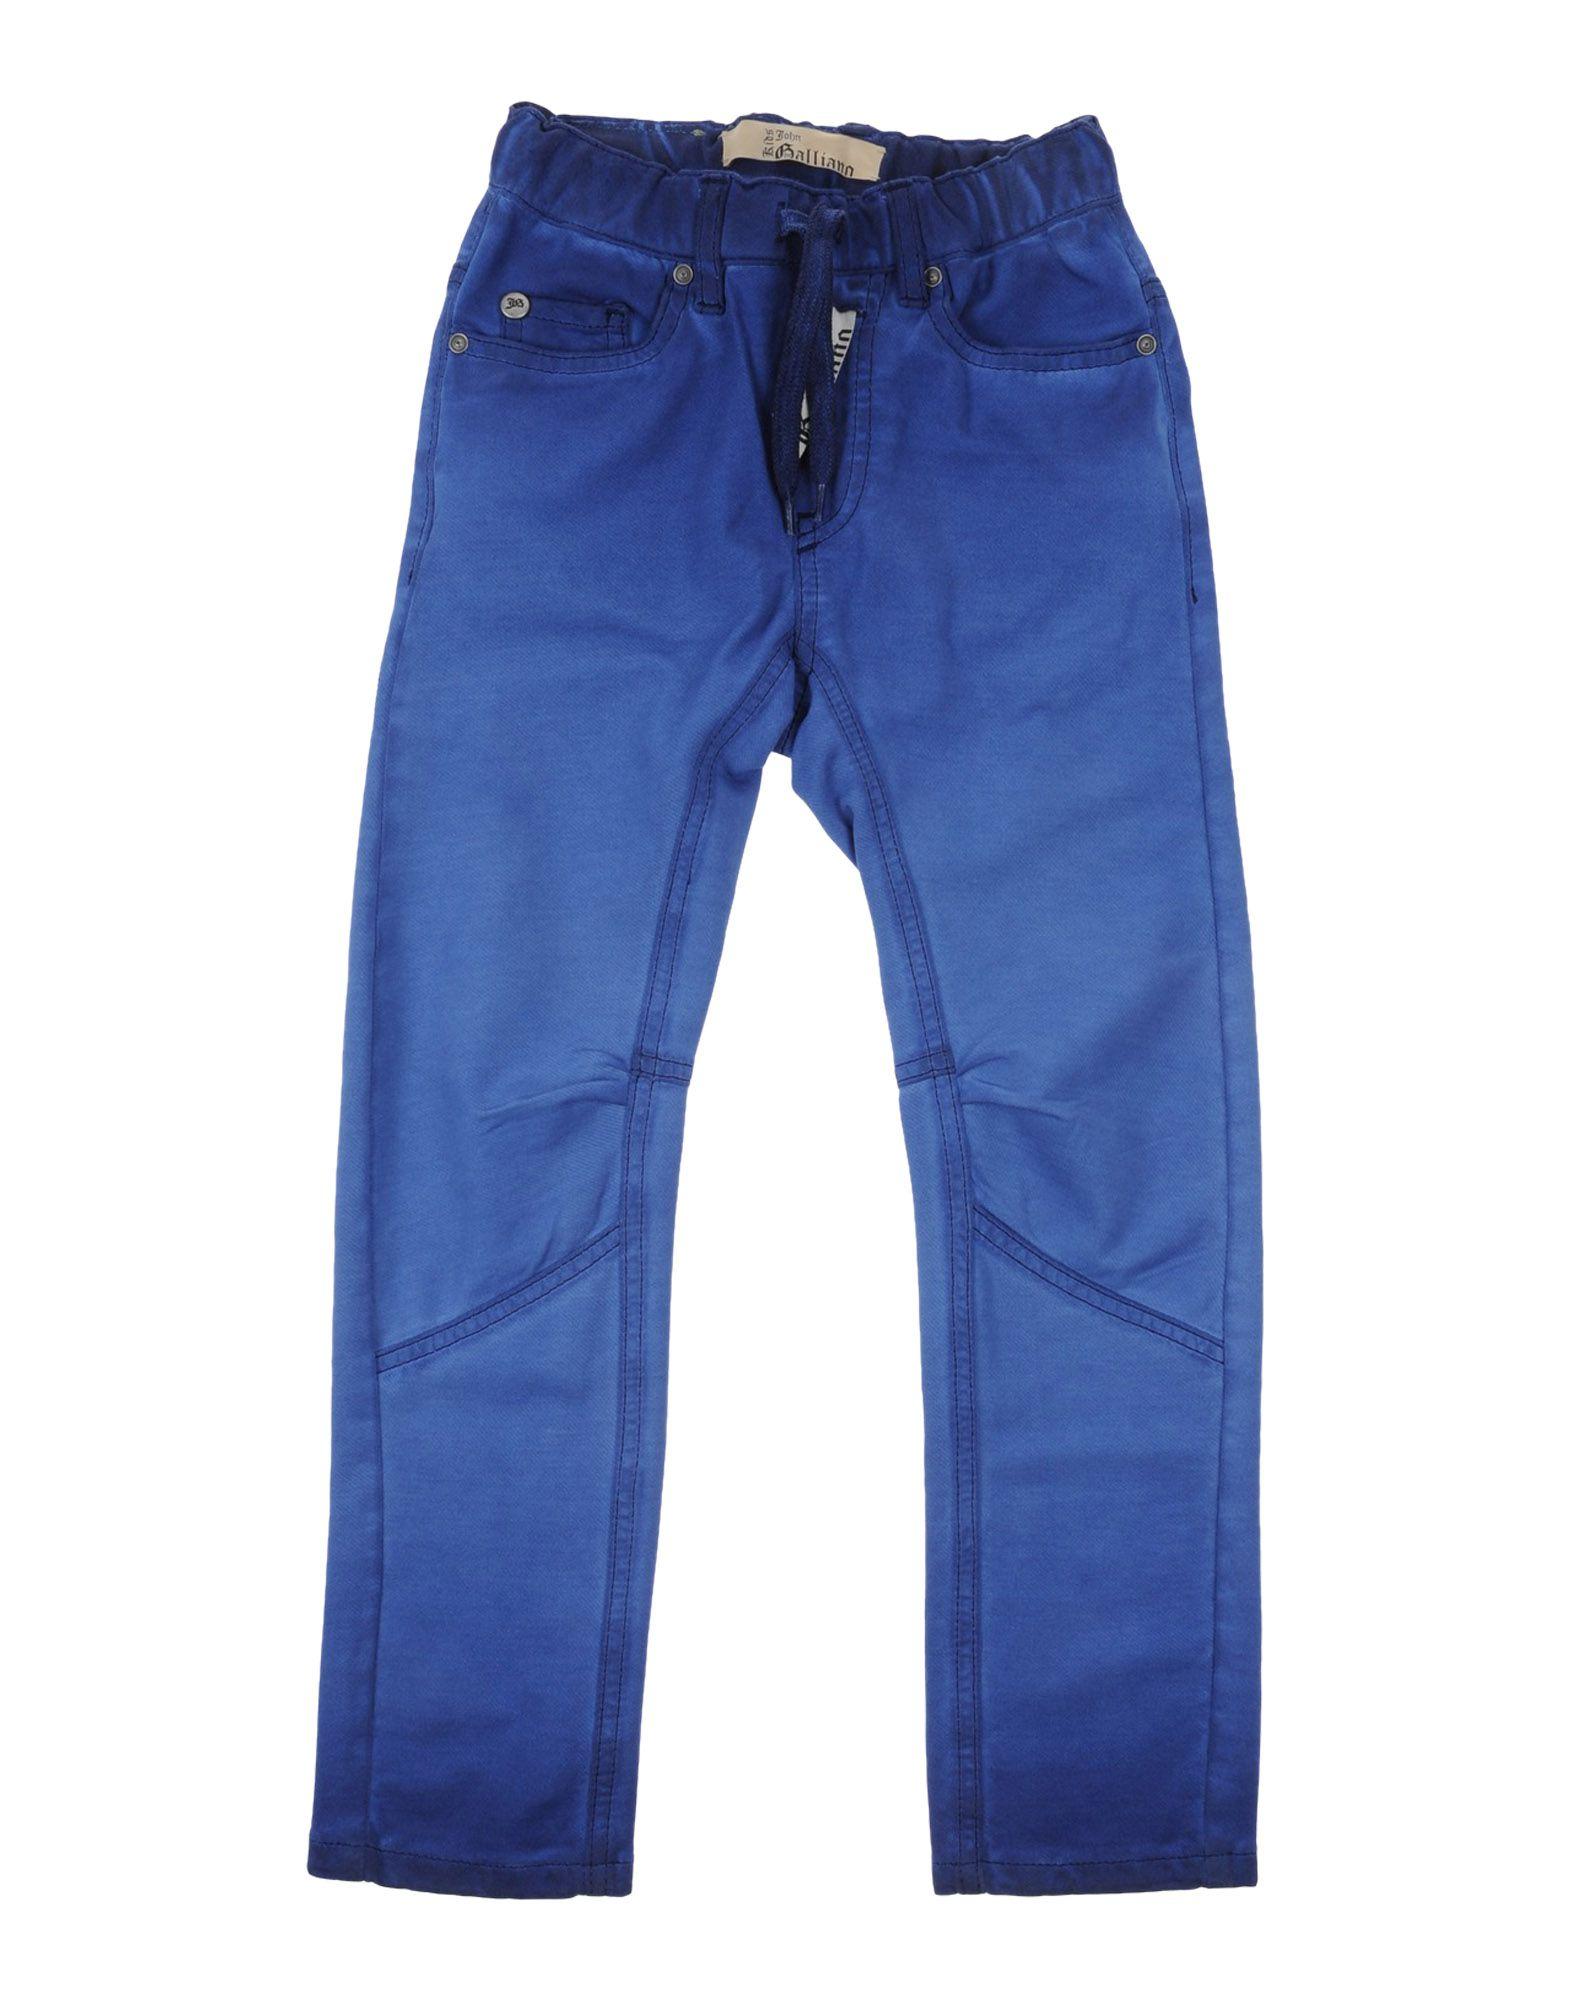 JOHN GALLIANO KIDS Casual pants